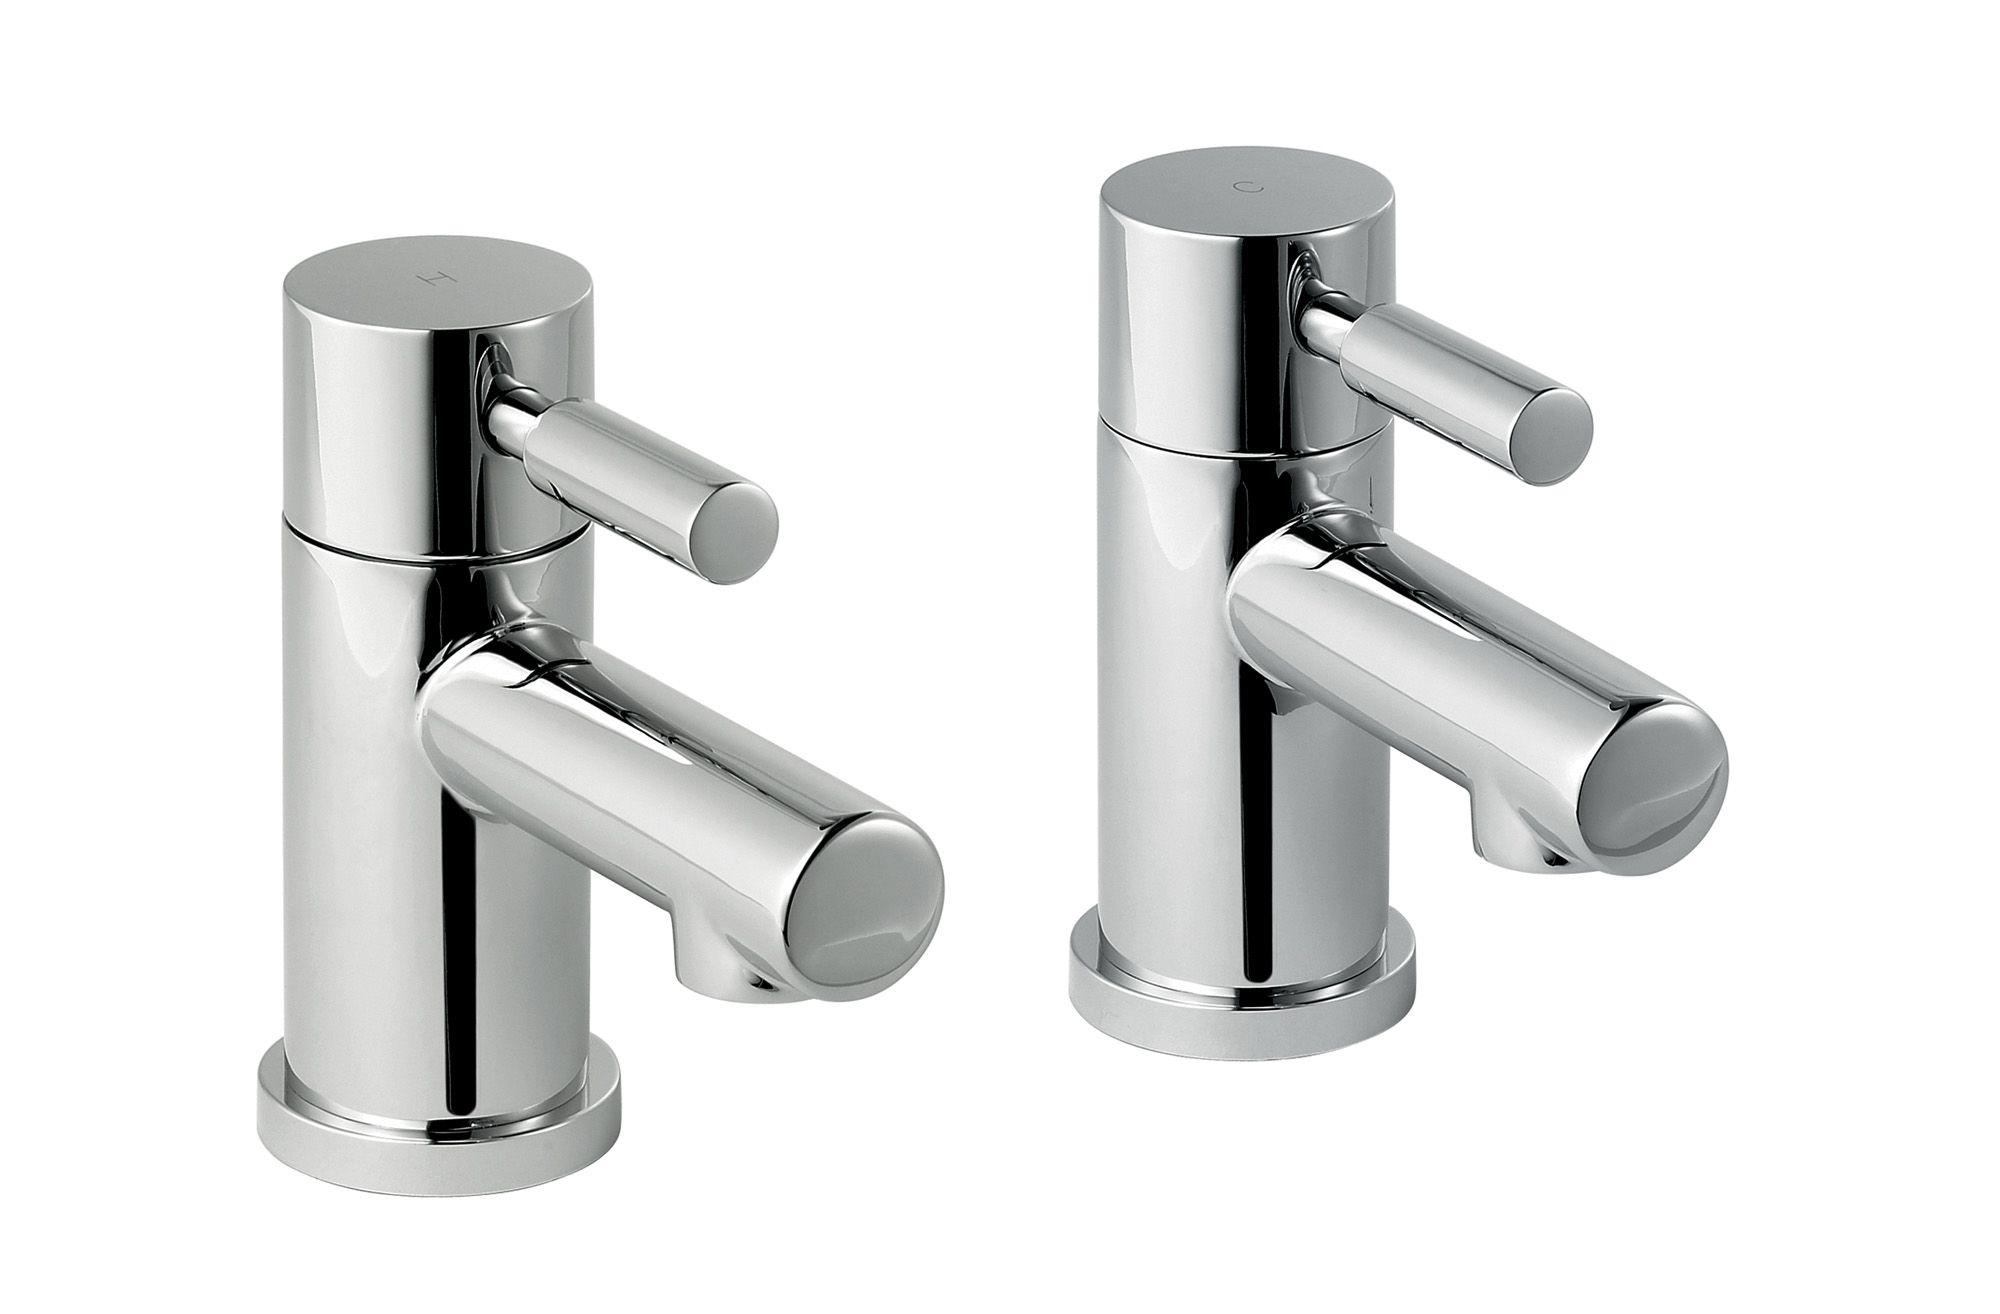 Cooke & Lewis Cirque Hot & cold basin pillar tap | Departments | DIY ...